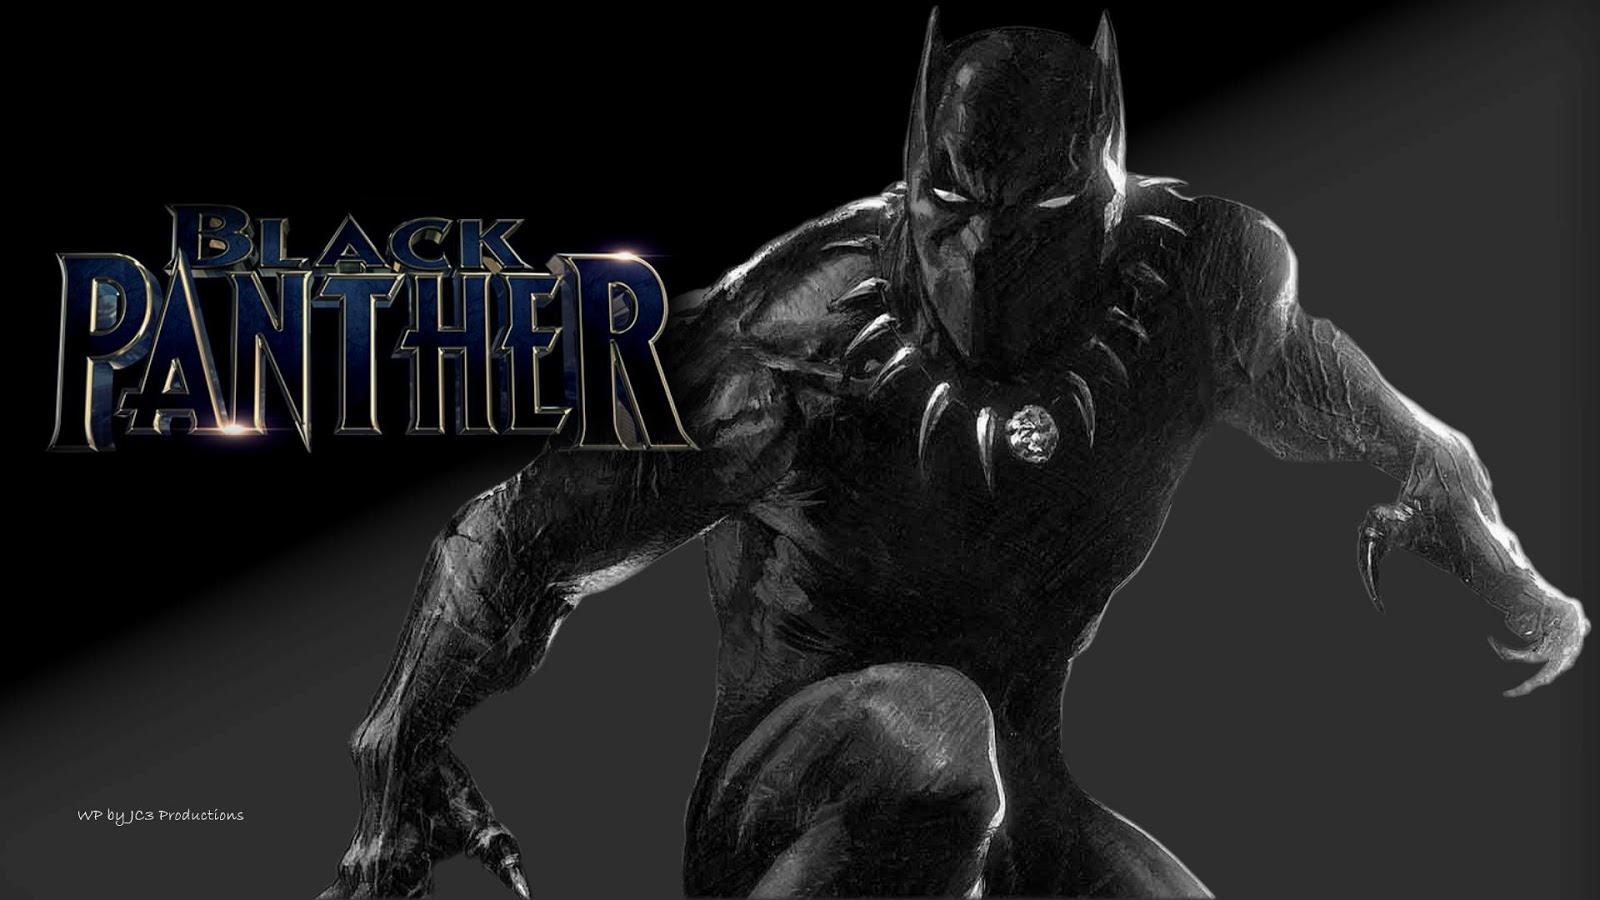 Fondos 4k Hd De Panteras Negras: Pantera Negra [1080p] MEGA Y Drive